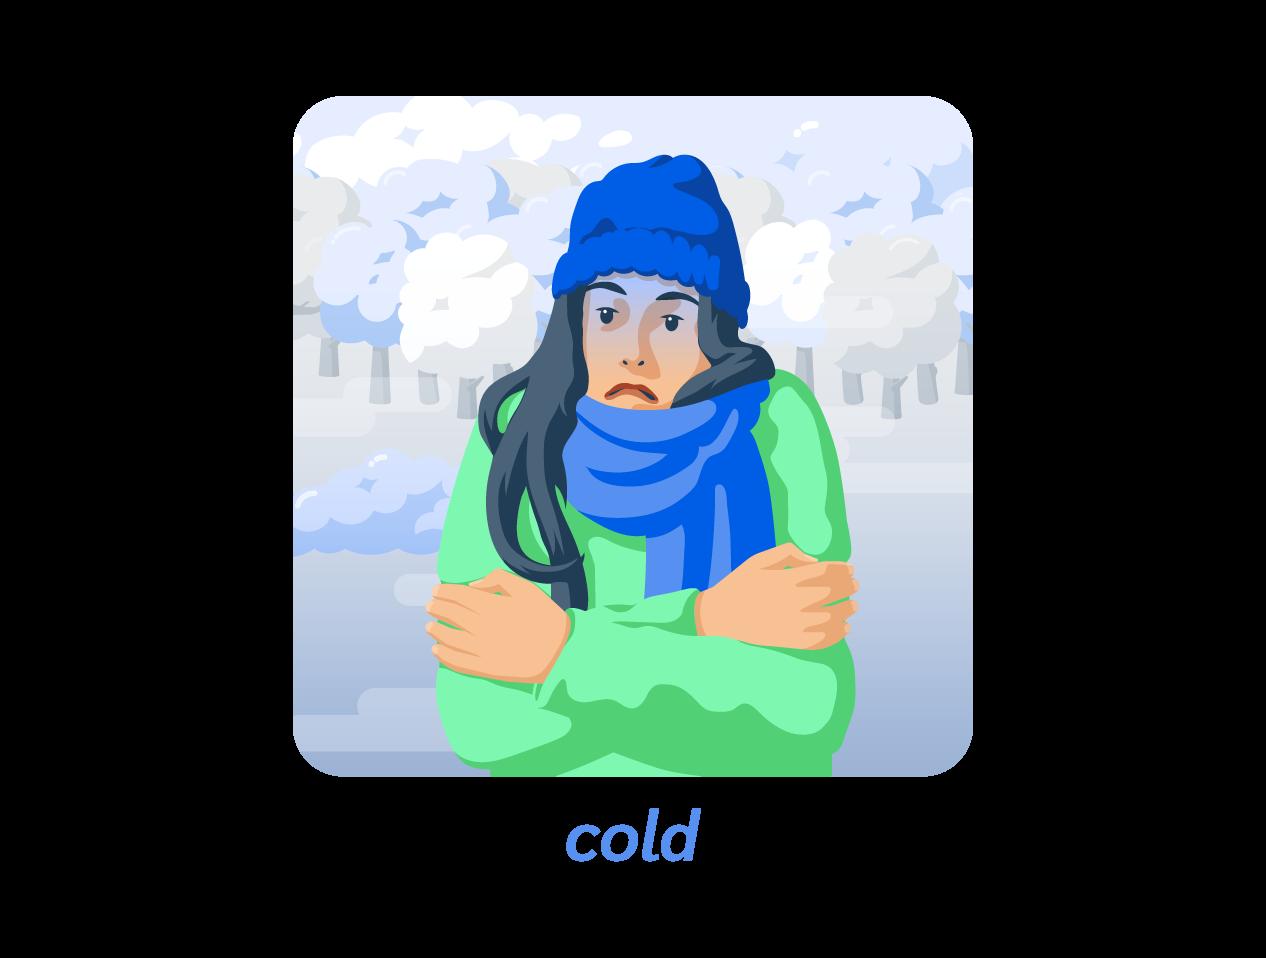 cold froid anglais météo weather